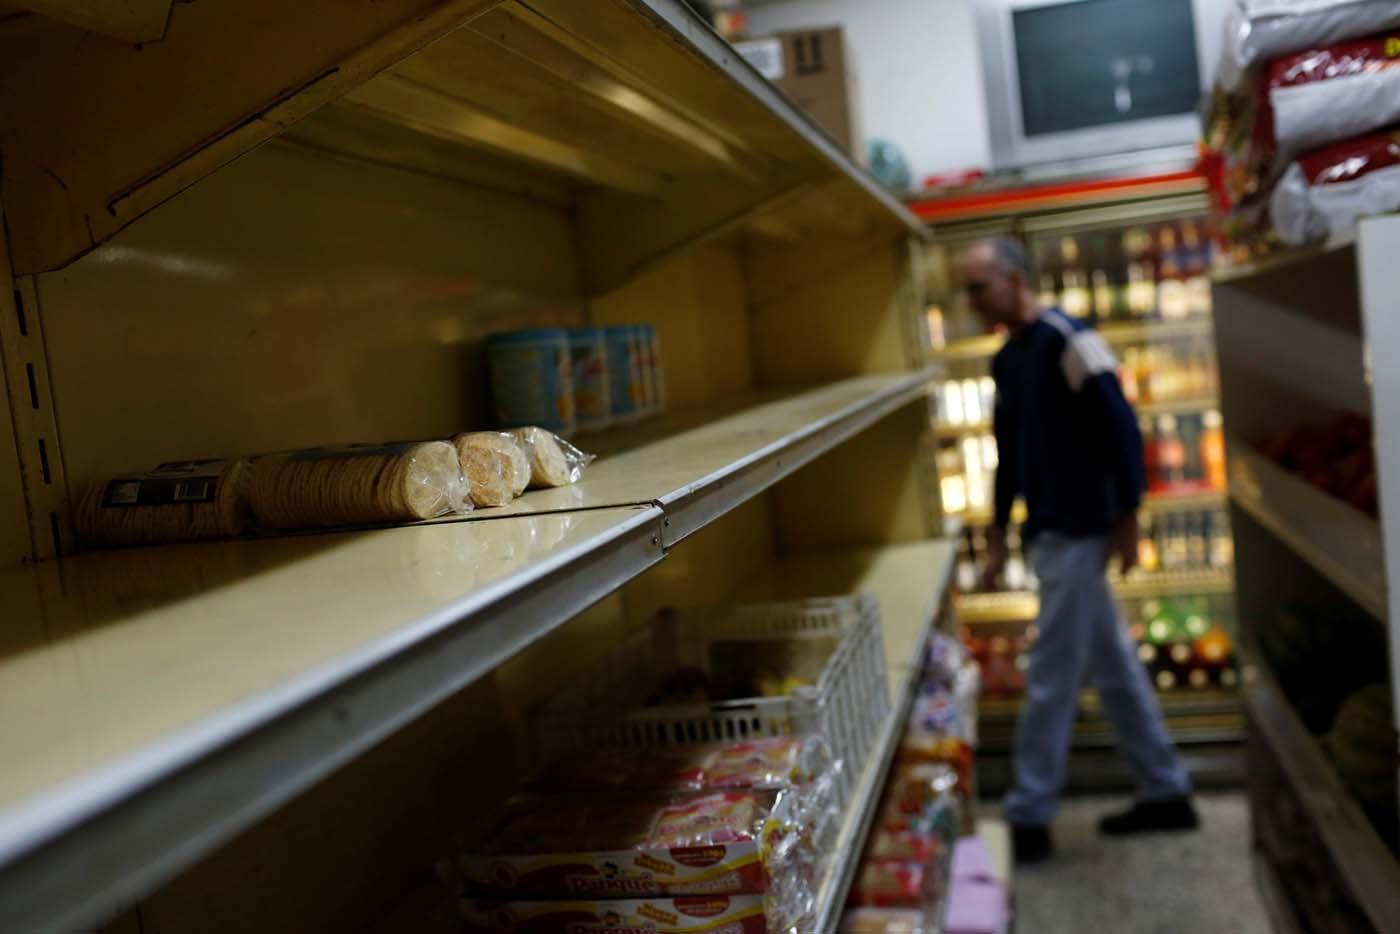 A man walks past empty shelves at a supermarket in Caracas, Venezuela March 9, 2017. REUTERS/Carlos Garcia Rawlins